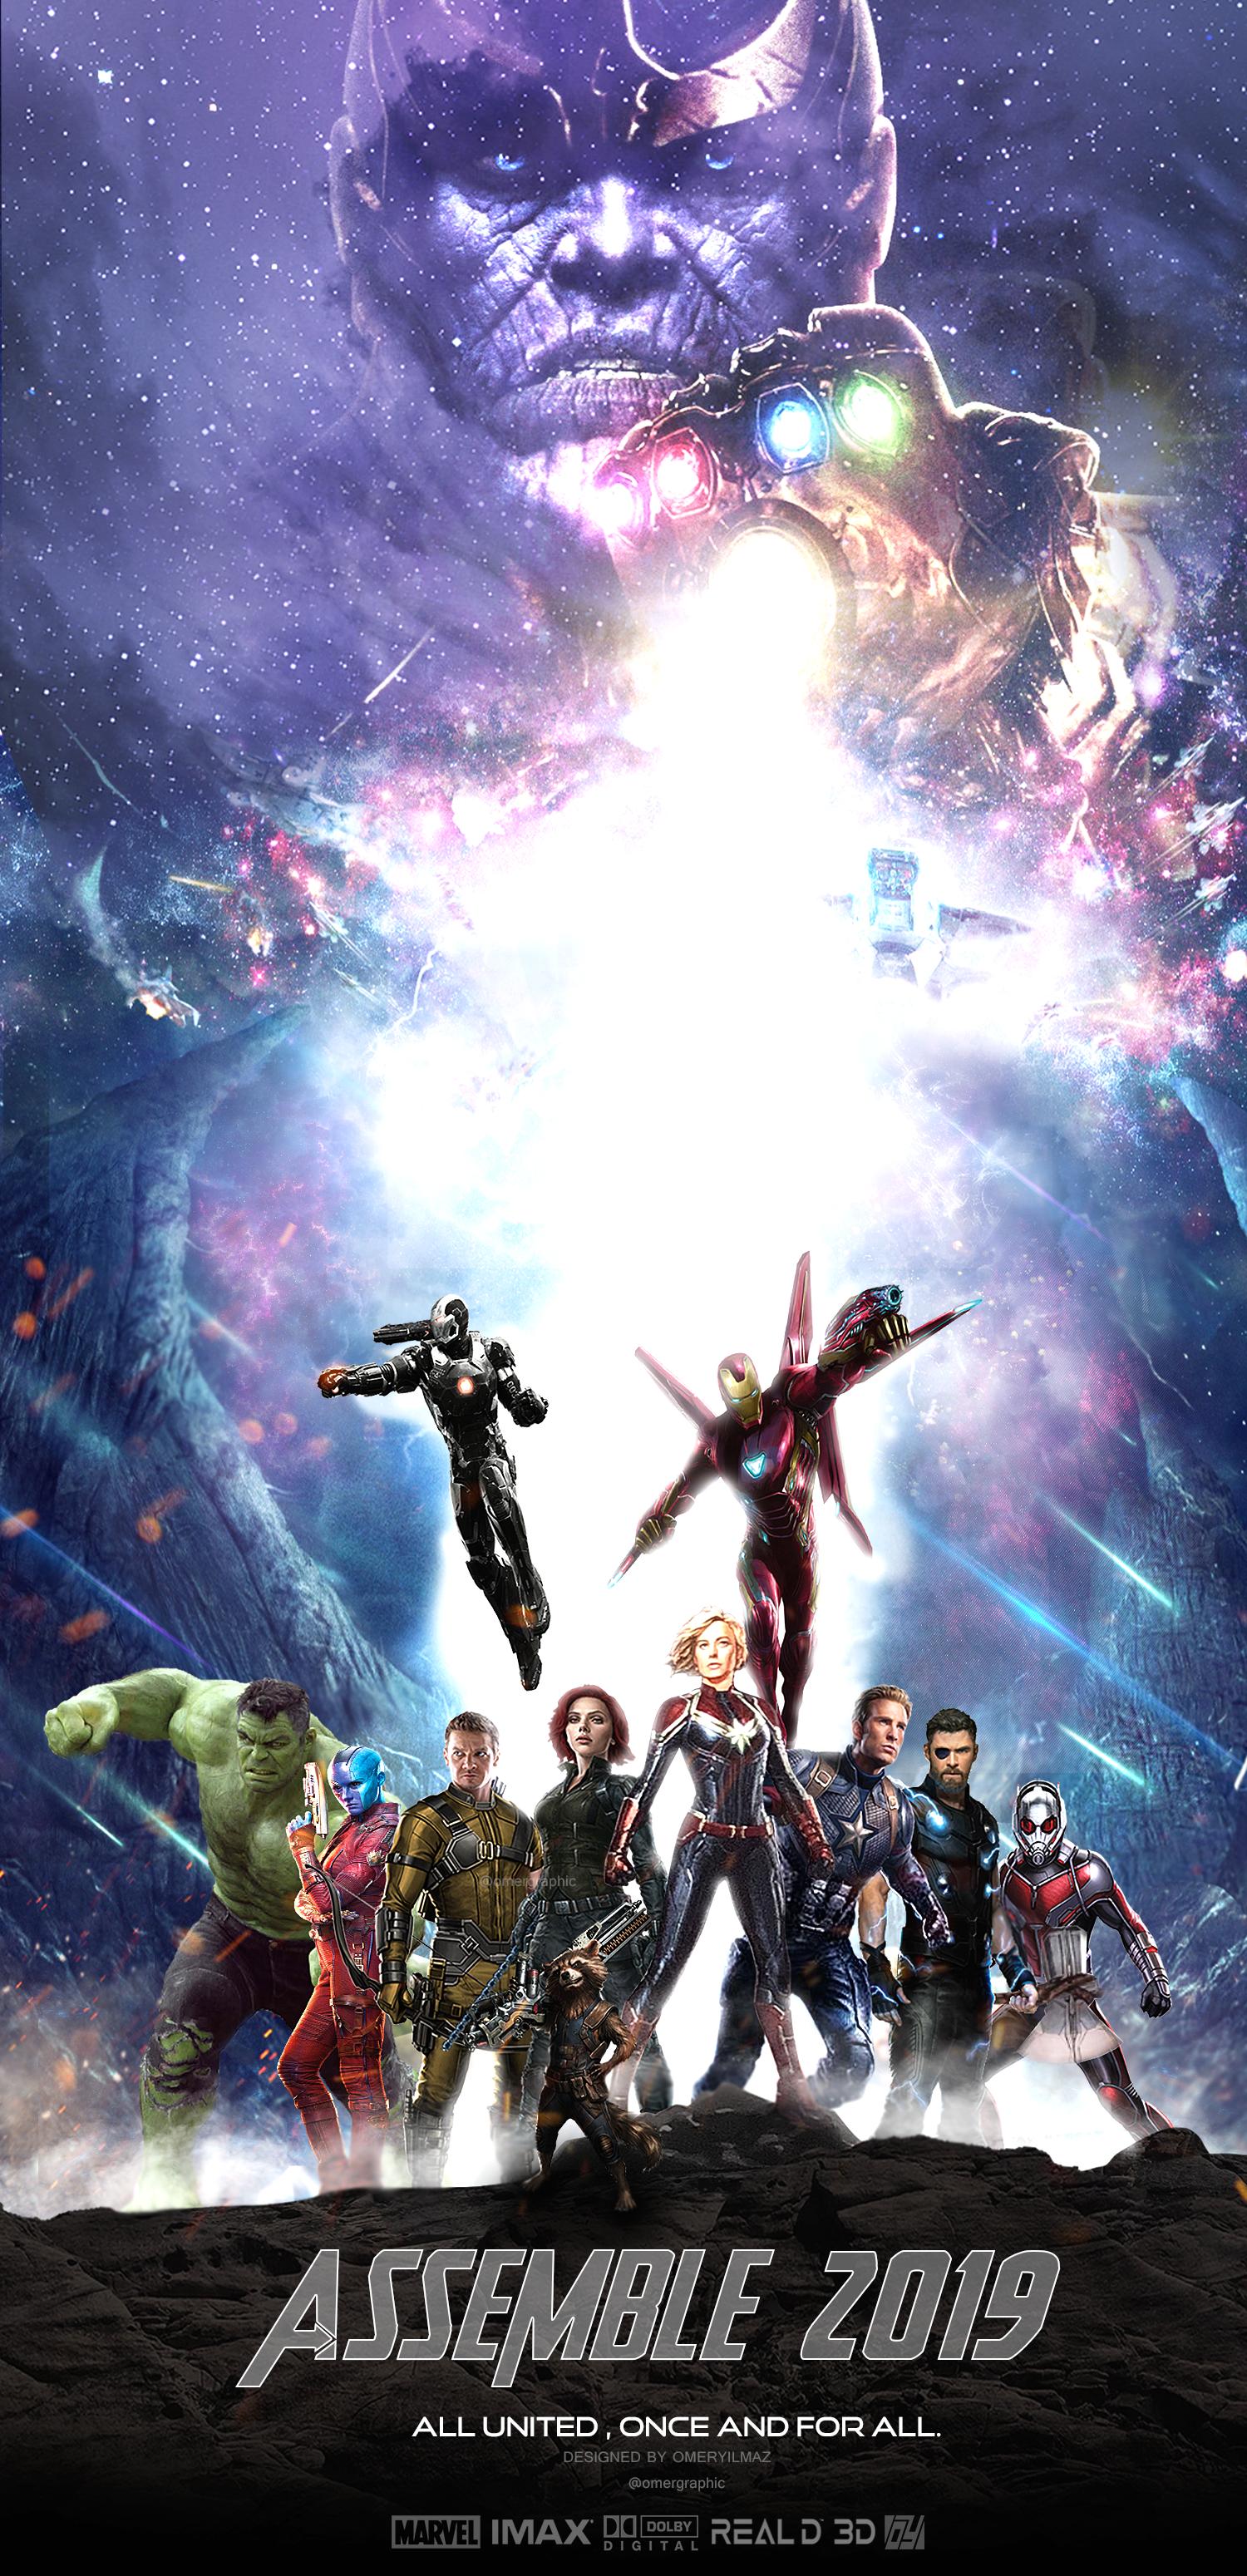 Avengers 4 Infinity War Part 2 Poster By Ylmzdesign On Deviantart